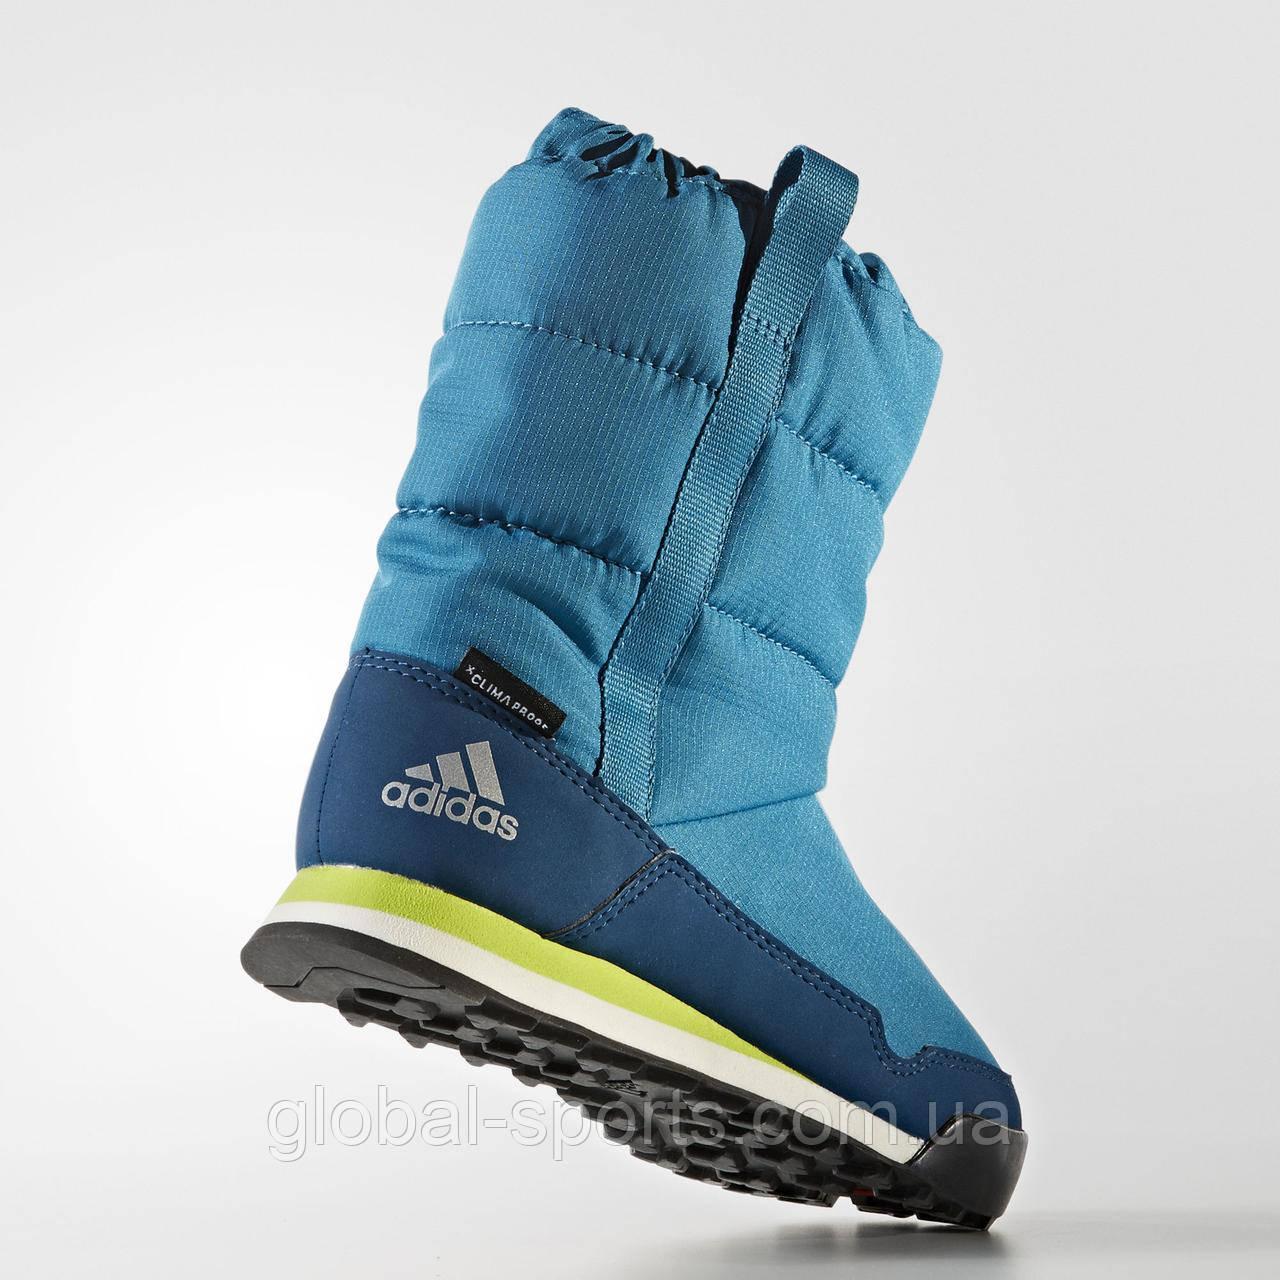 386d4a8a ... фото Детские сапоги Adidas CW SNOWPITCH SLIP-ON K (Артикул: S80823), ...